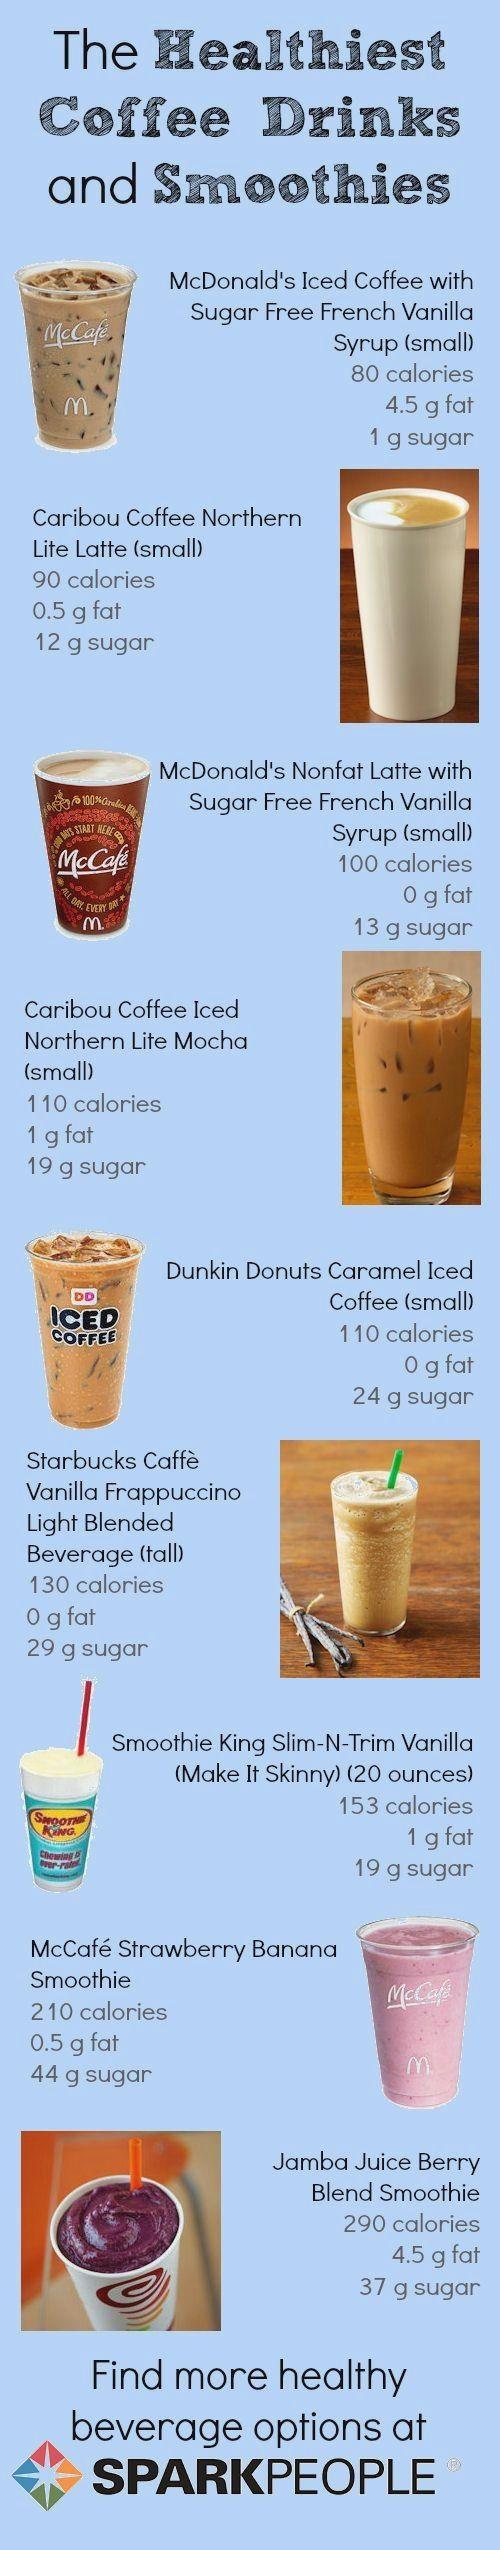 Pin by eduard.zhiravov on Health Healthy coffee drinks